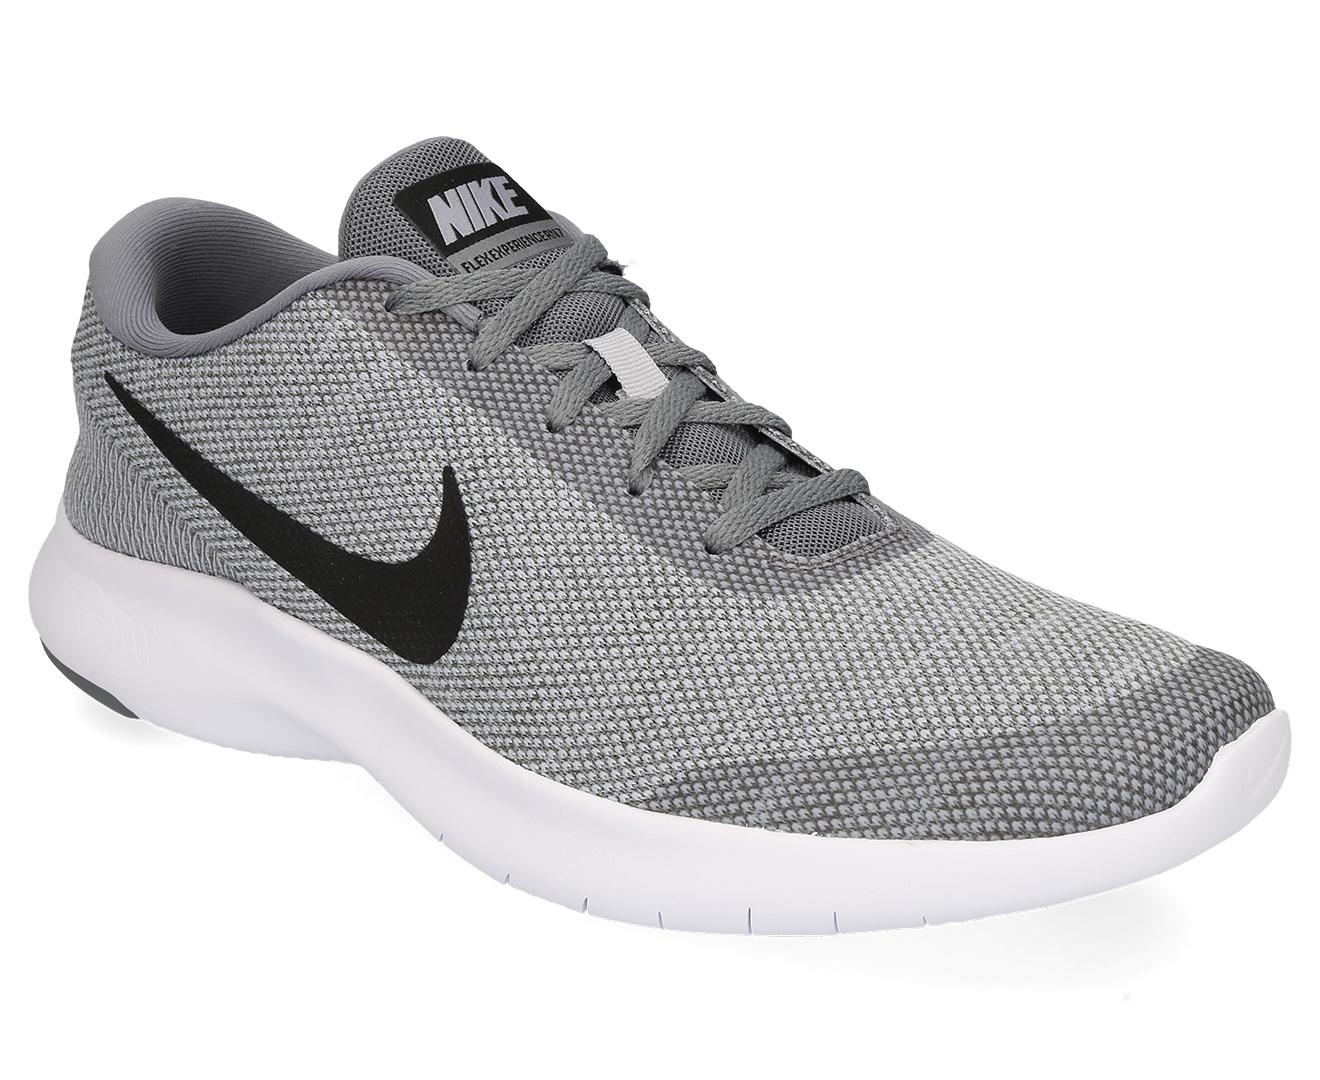 best service 572a5 6215f Nike Men s Flex Experience Run 7 Shoe - Wolf Grey Black-Cool Grey